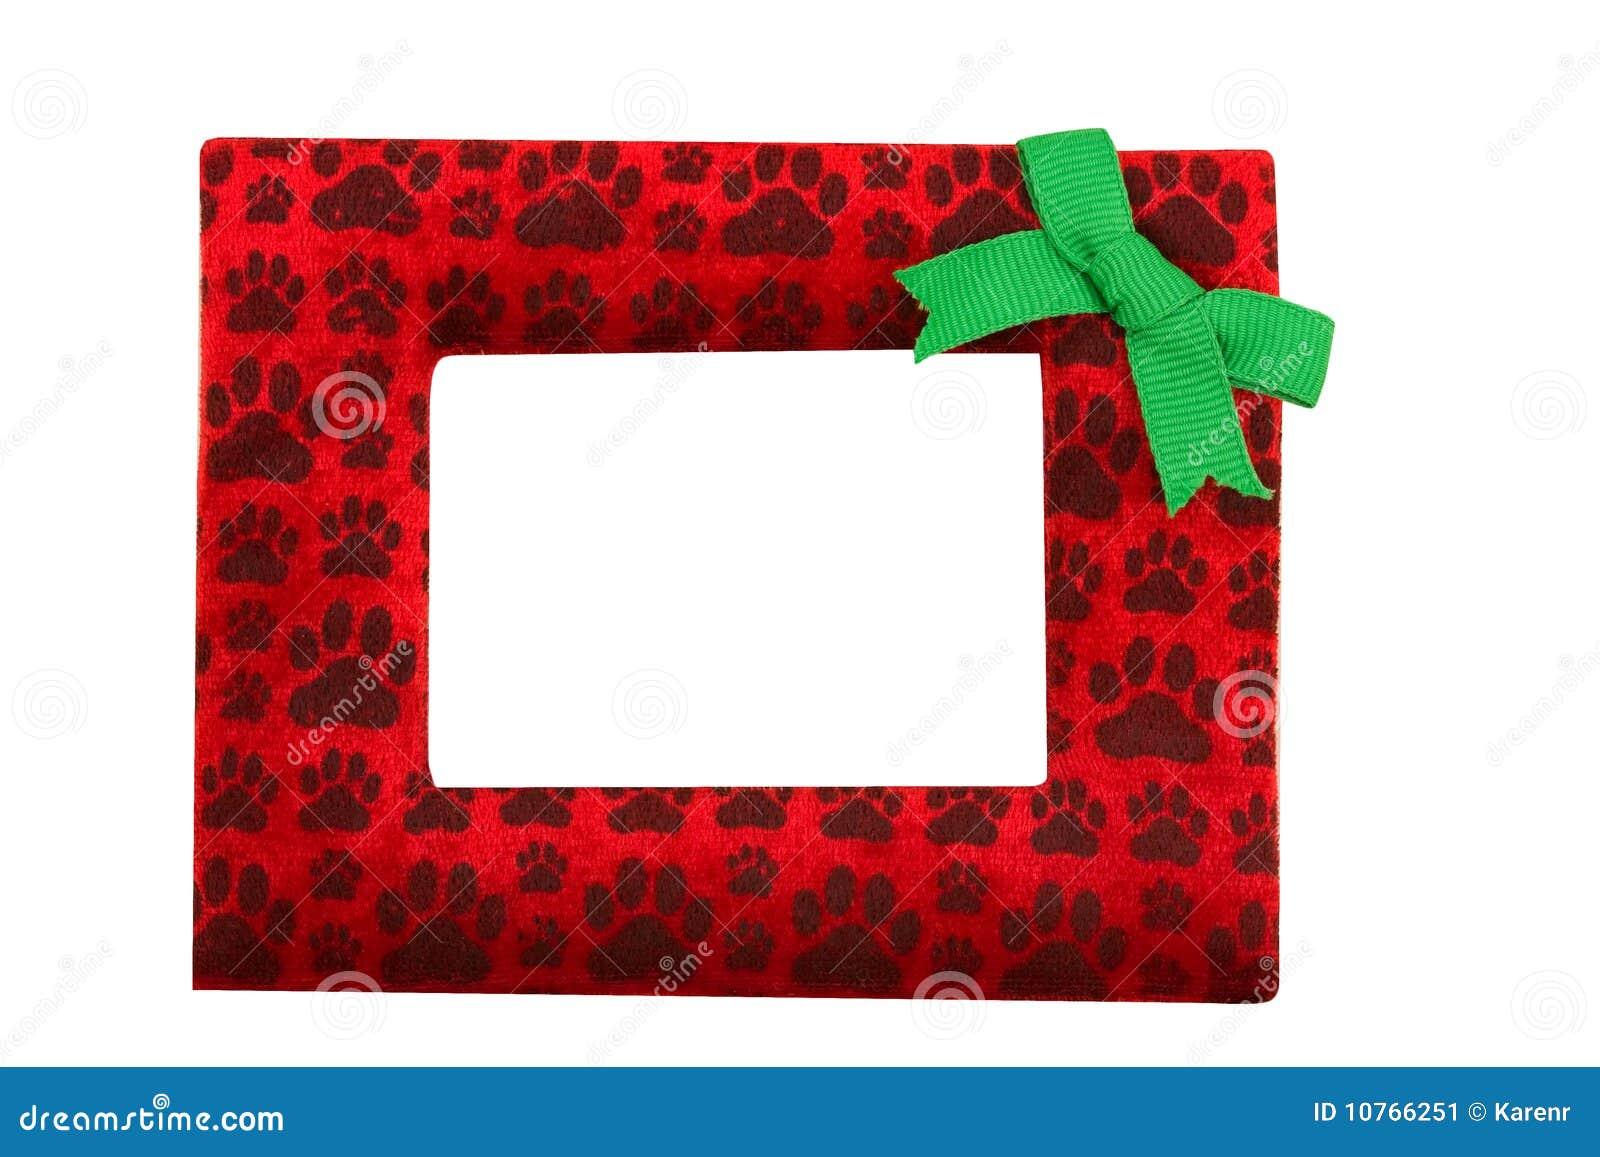 Red And Green Christmas Dog Paw Print Border